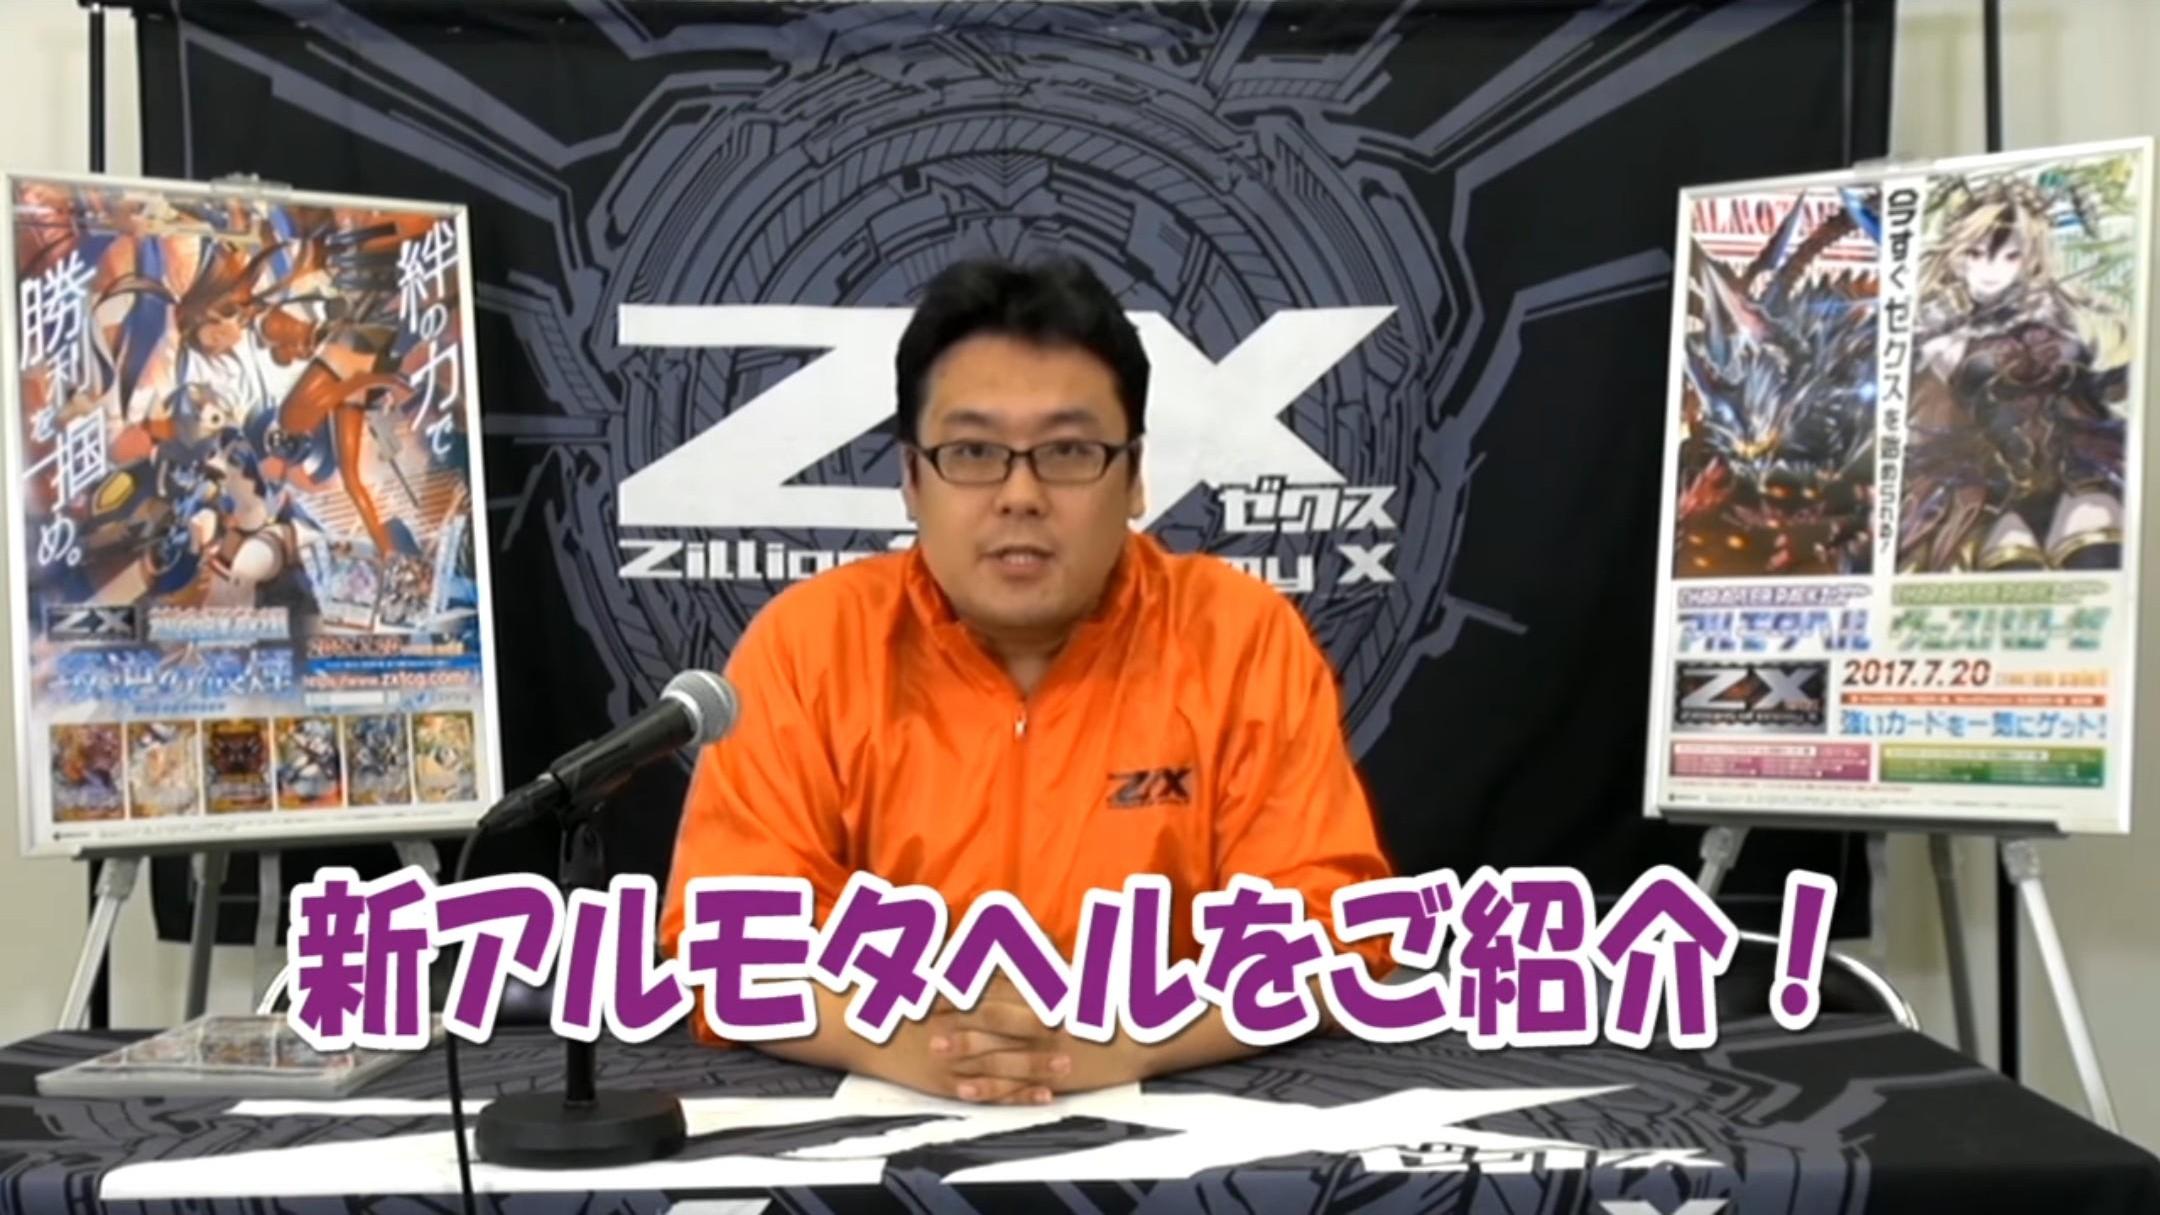 zx-youtube-1700517-000.jpg